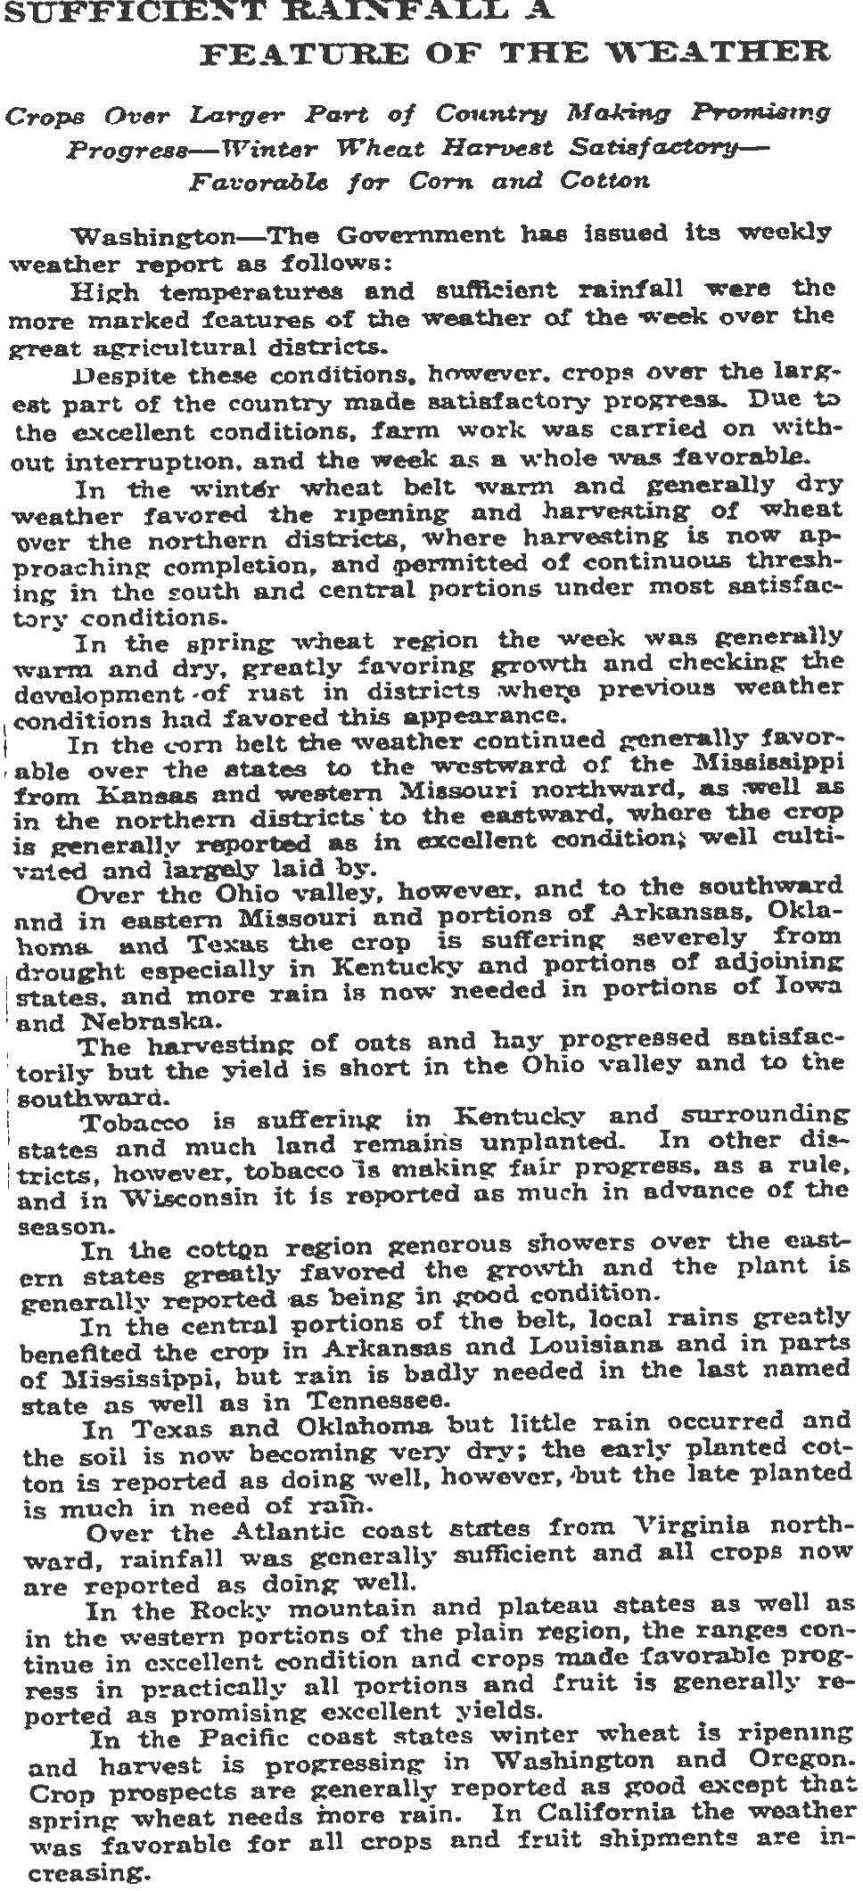 Source: Wall Street Journal (July 15, 1914)